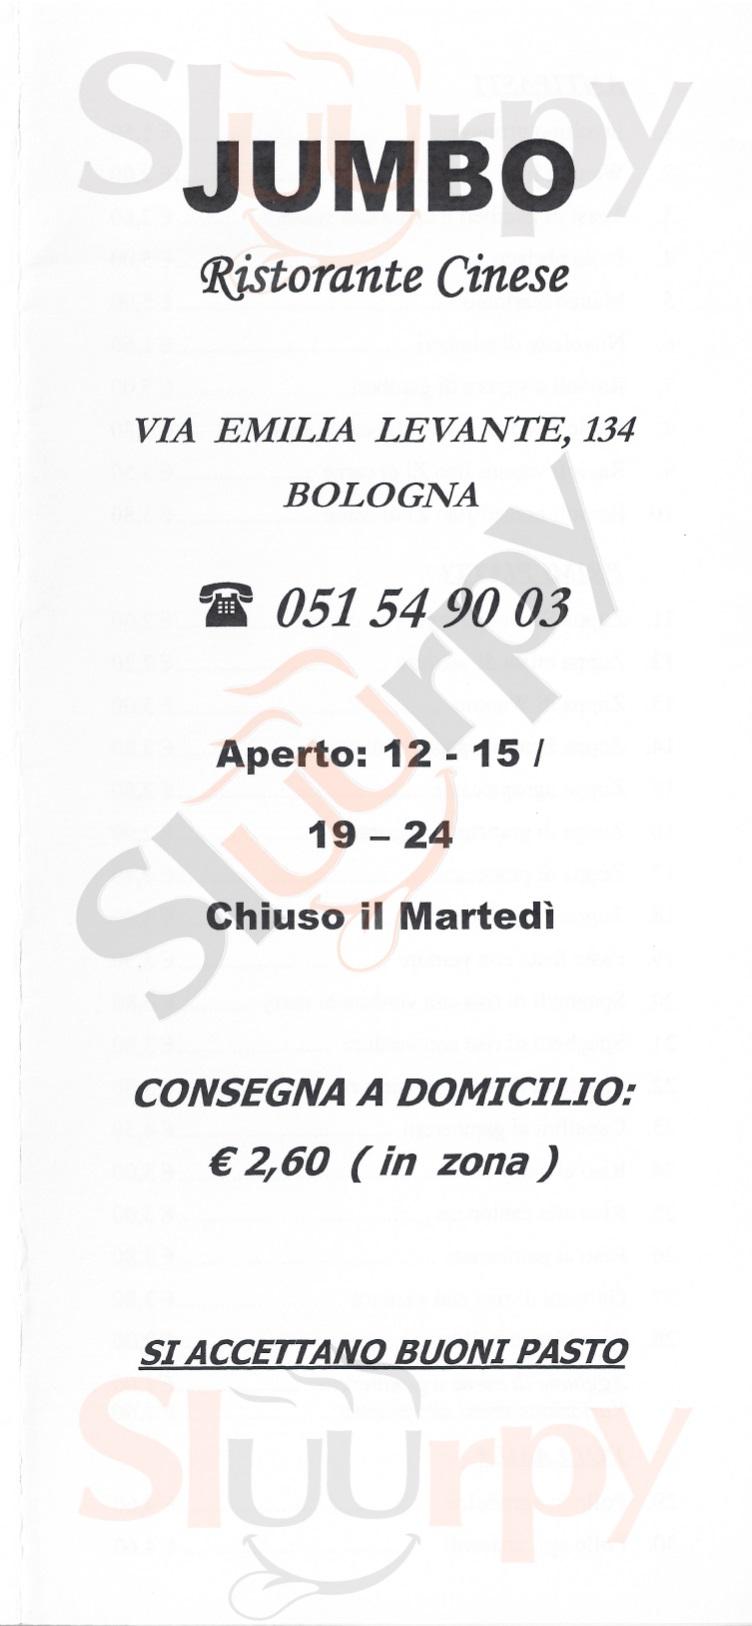 Jumbo Bologna menù 1 pagina